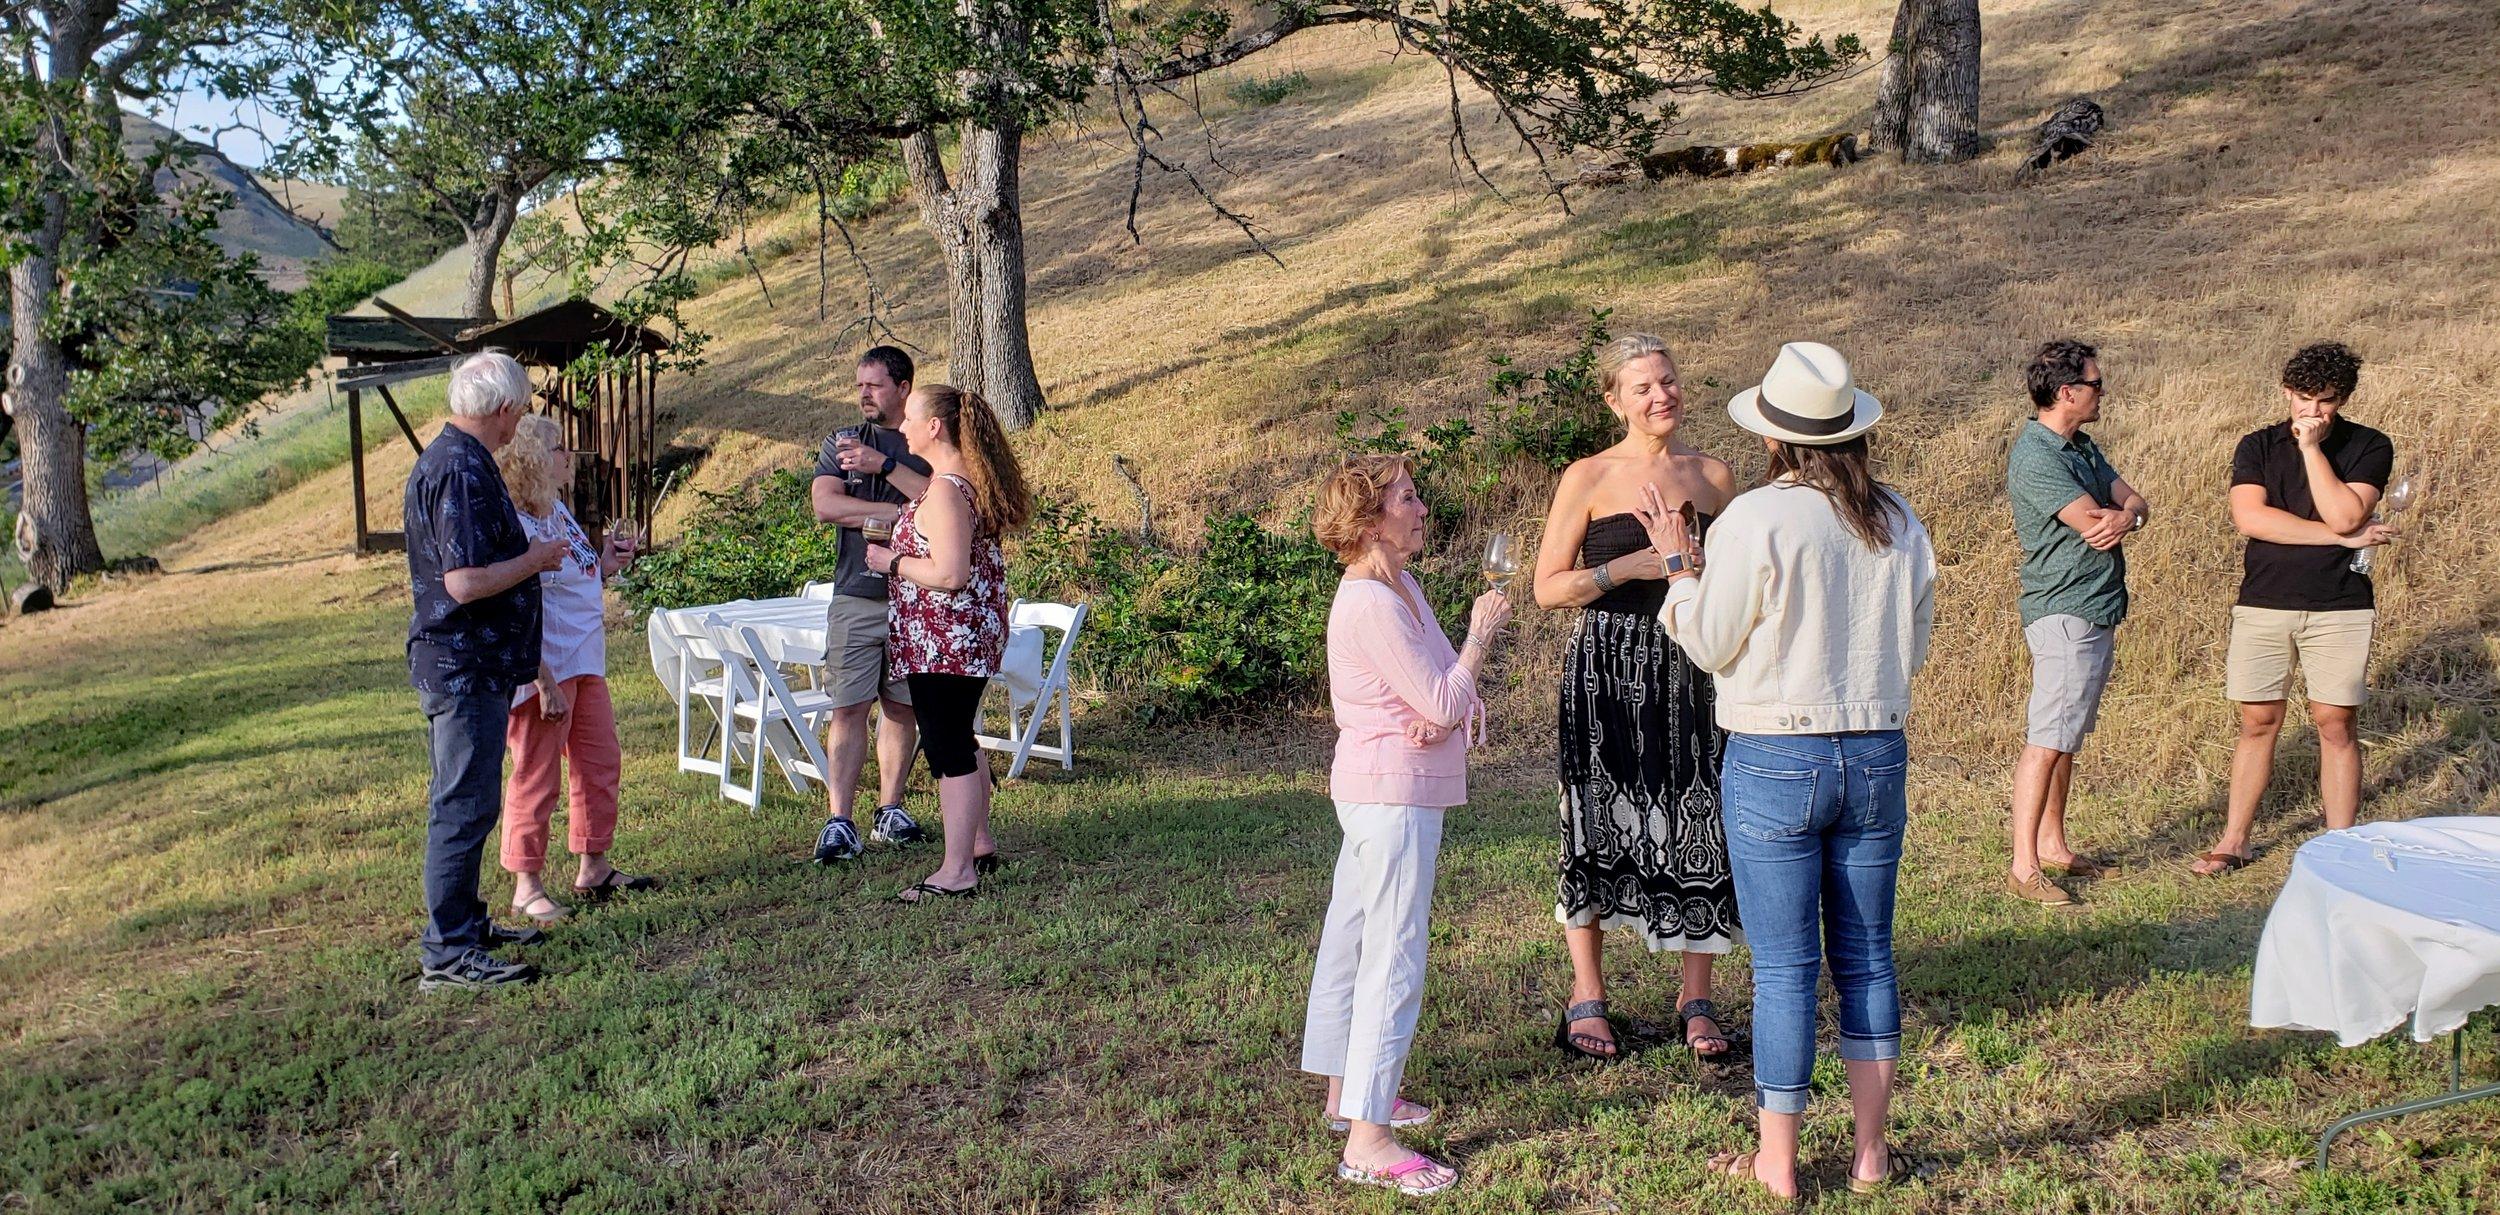 Fellowship members mingling in the yard